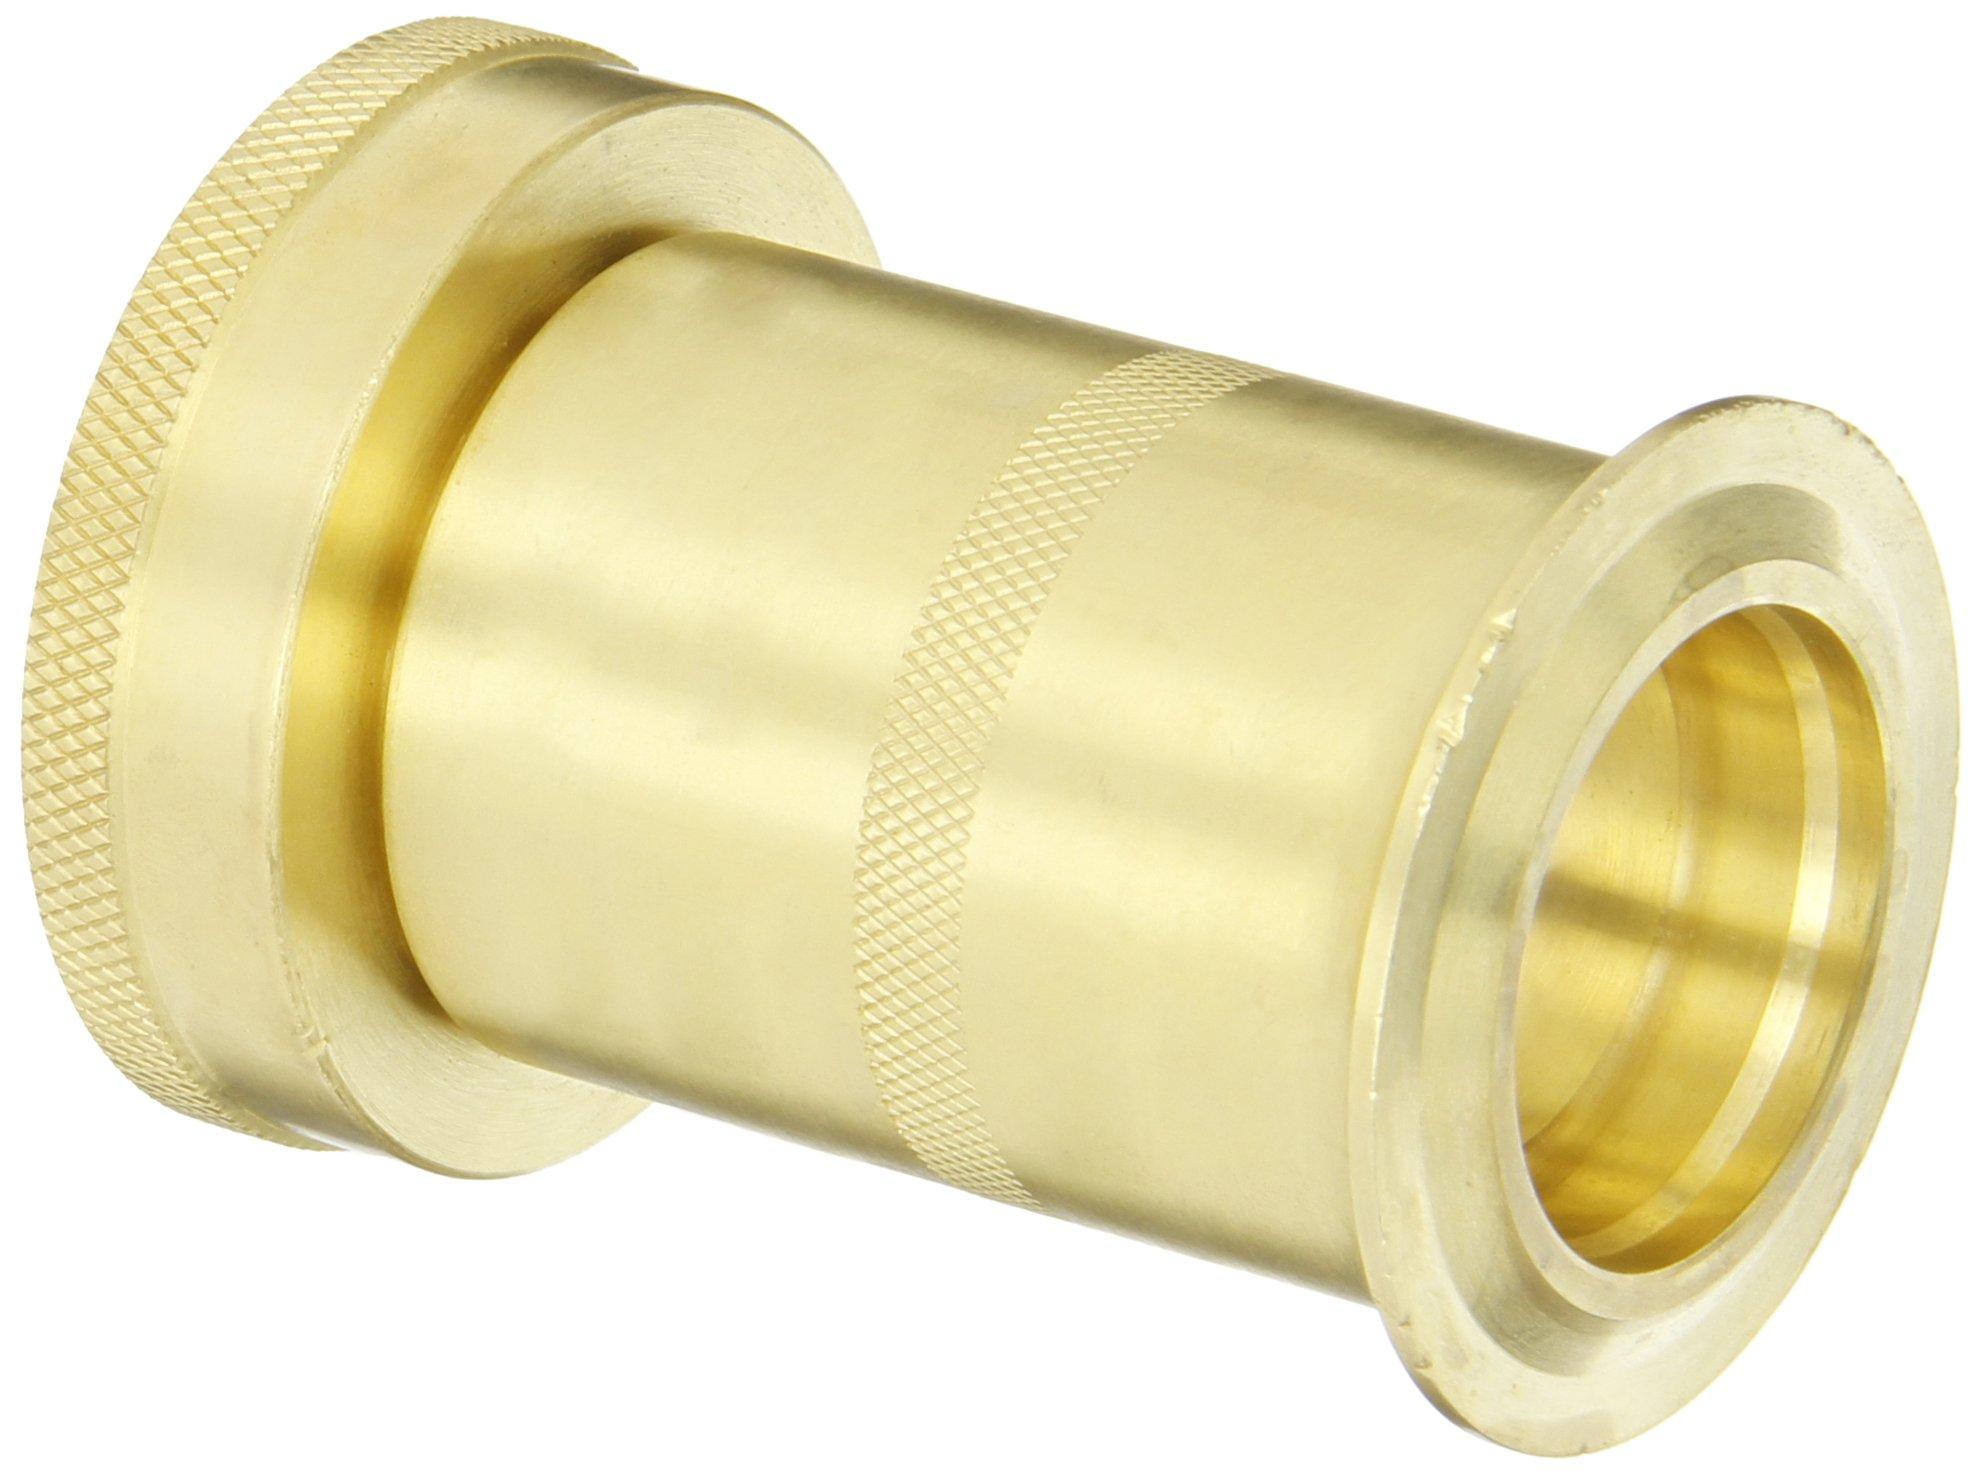 Dixon Valve BRN150NST-I Brass Fire Equipment, Global Rack Nozzle, 1-1/2'' NST (NH) Thread by Dixon Valve & Coupling